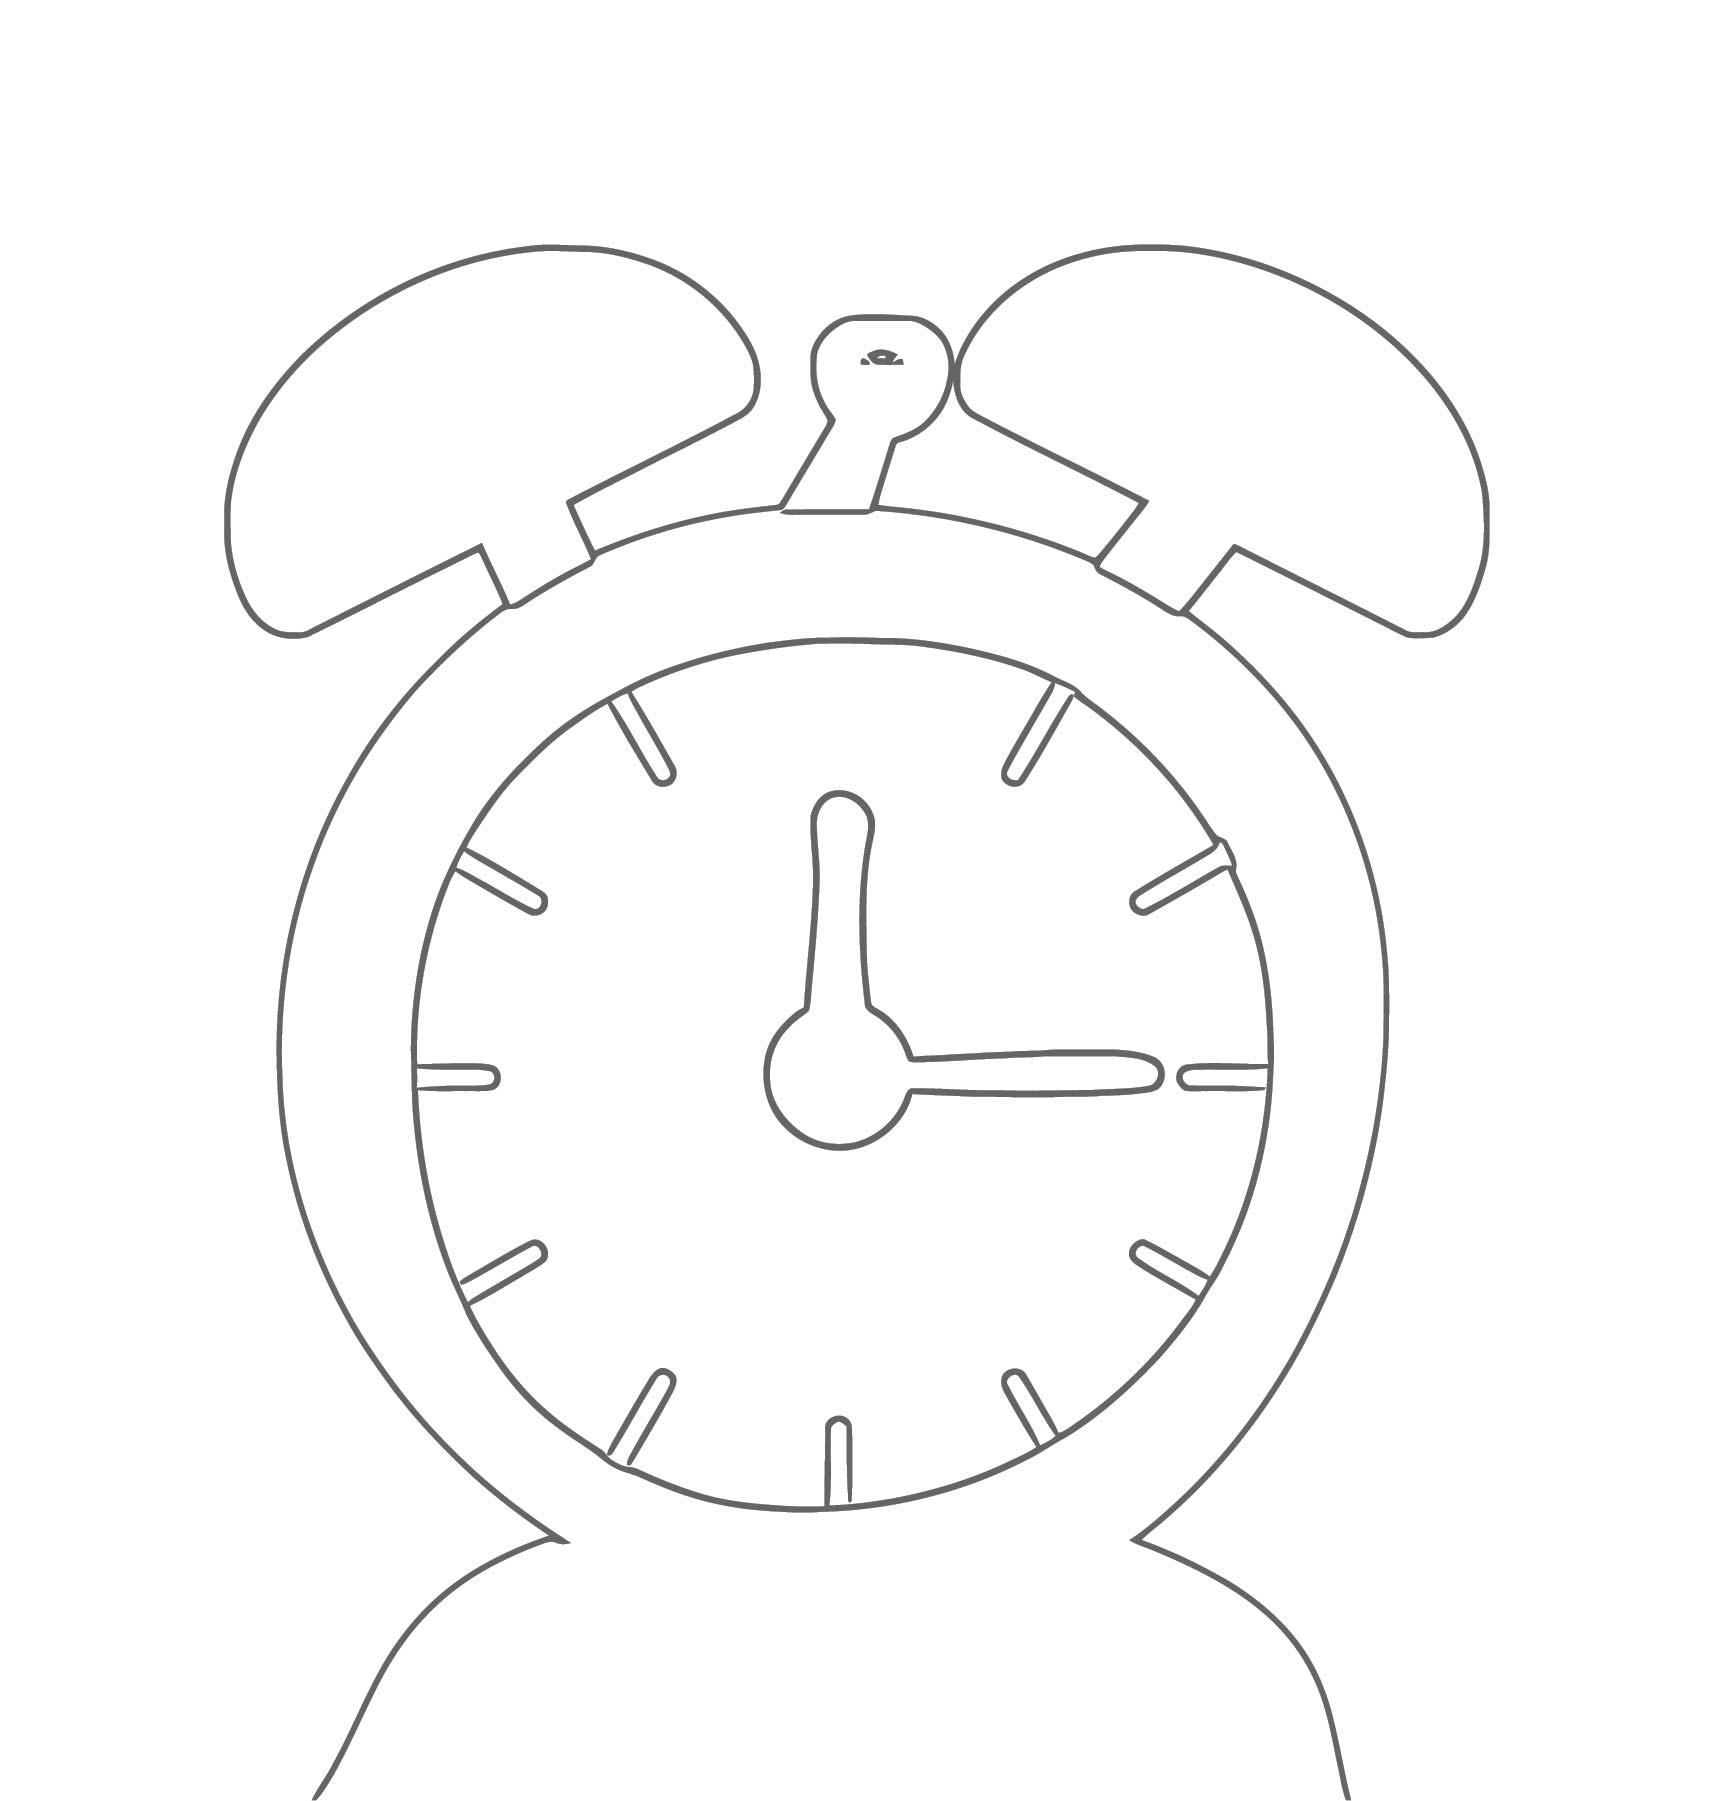 Outline Alarm Clo Free Printable Ck Cartoonized Free Printable Coloring Page